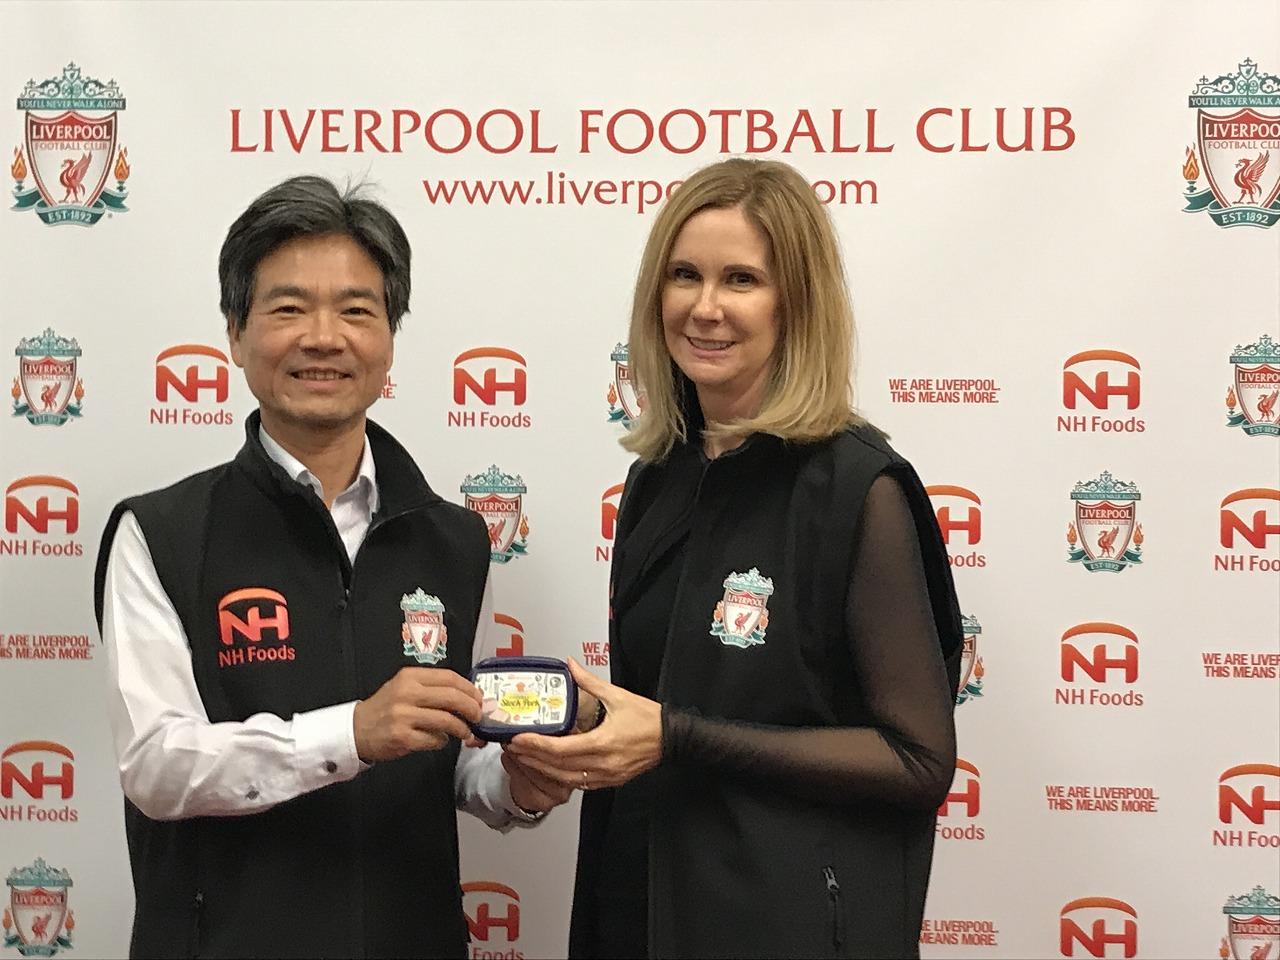 Nh Foods Ltd Makes North Liverpool Foodbank Donation